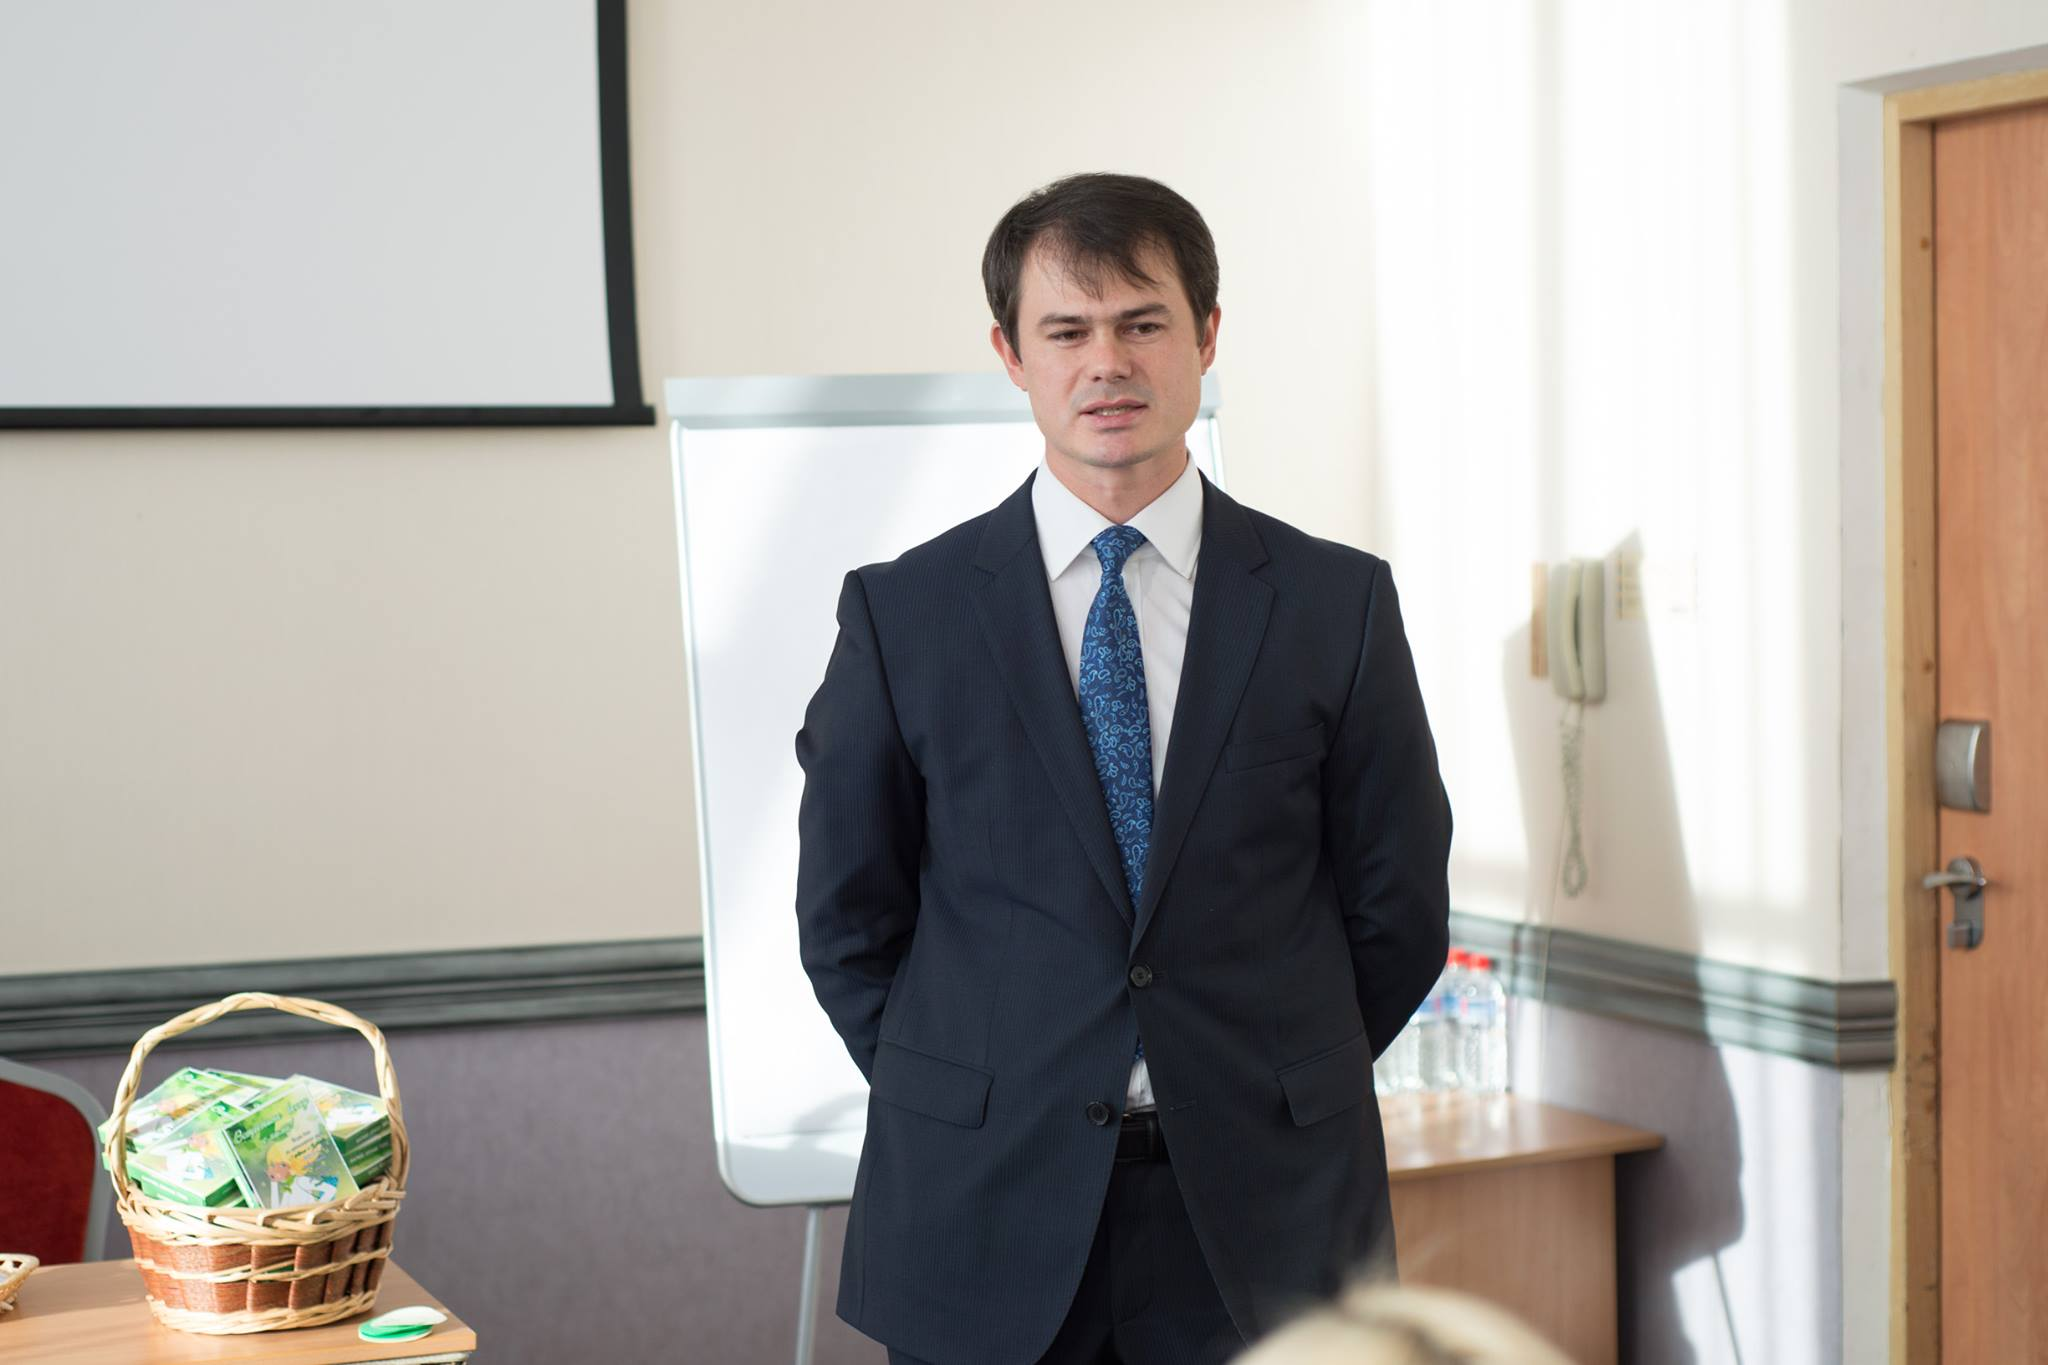 Бизнес-омбудсмен Александр Прасолов. Фото:facebook.com (Александр Прасолов)